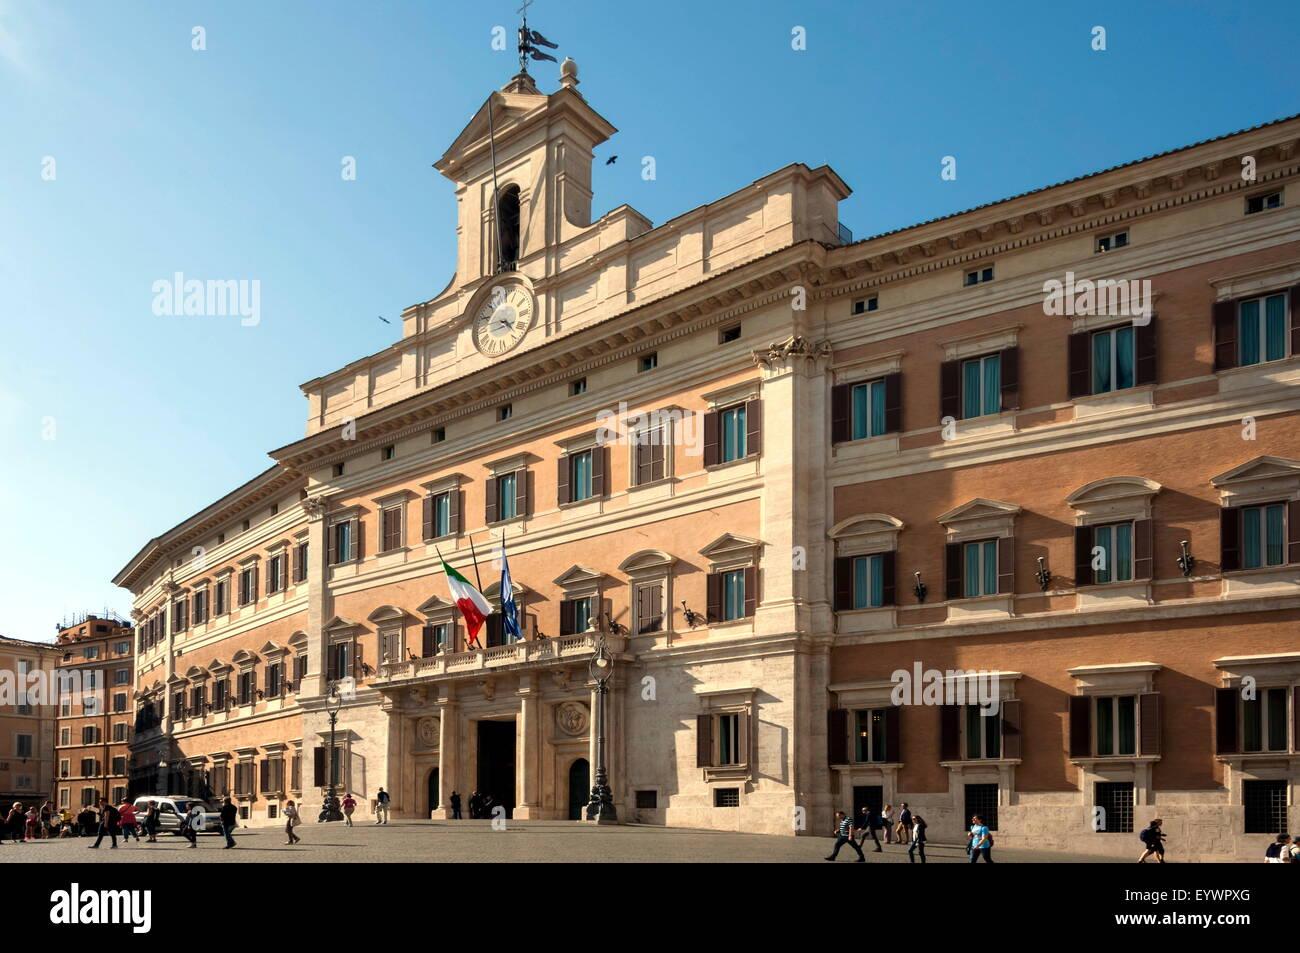 Palazzo Montecitorio, Parliament Building, Rome, Lazio, Italy, Europe - Stock Image